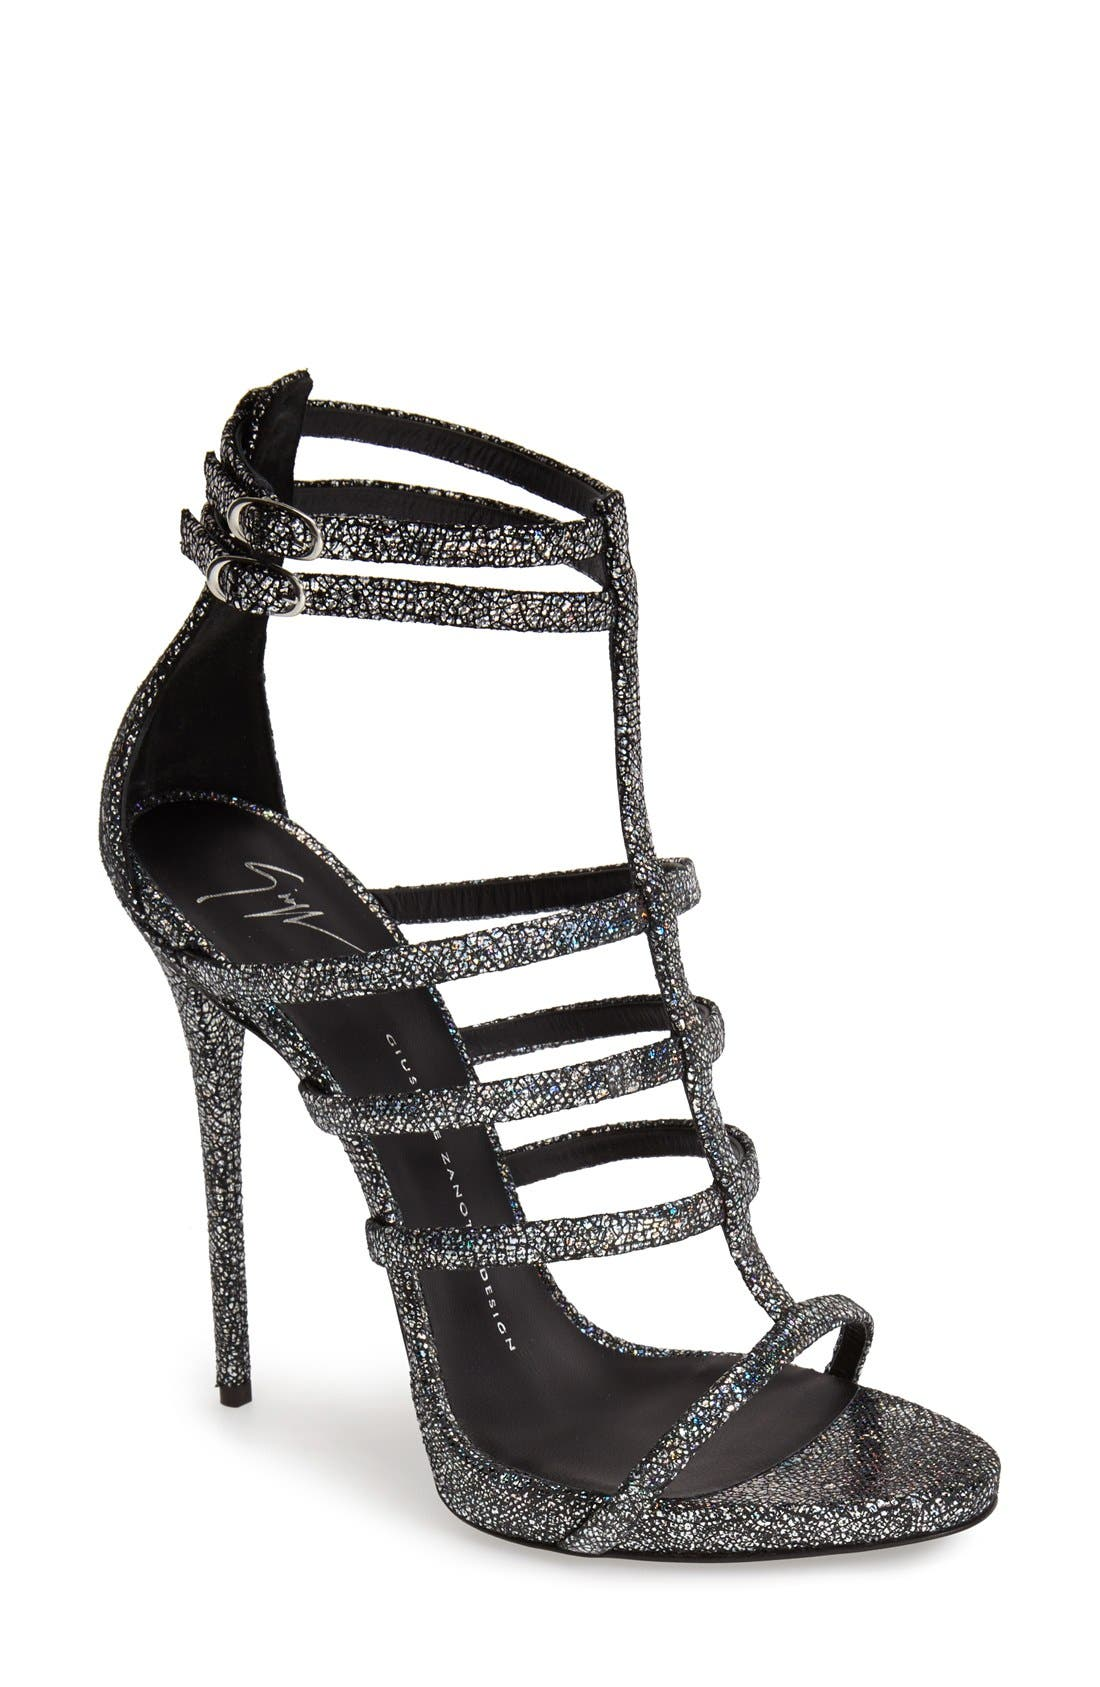 Main Image - Giuseppe Zanotti Metallic Strappy Sandal (Women)